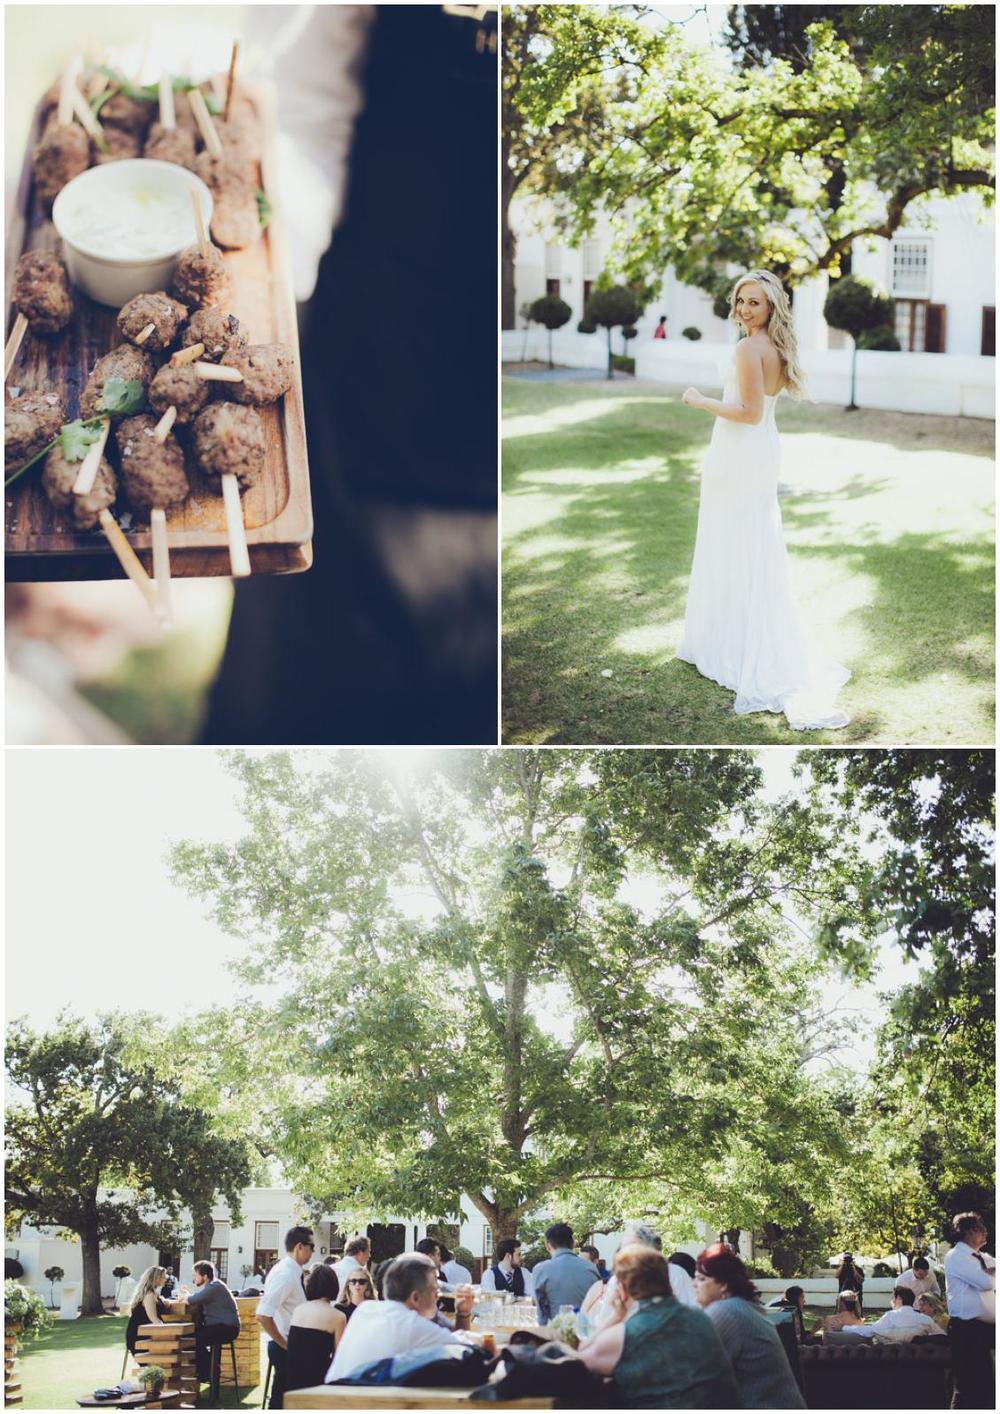 Janlo&Anina_Lanzeraz_Fionaclairphotography-181.jpg